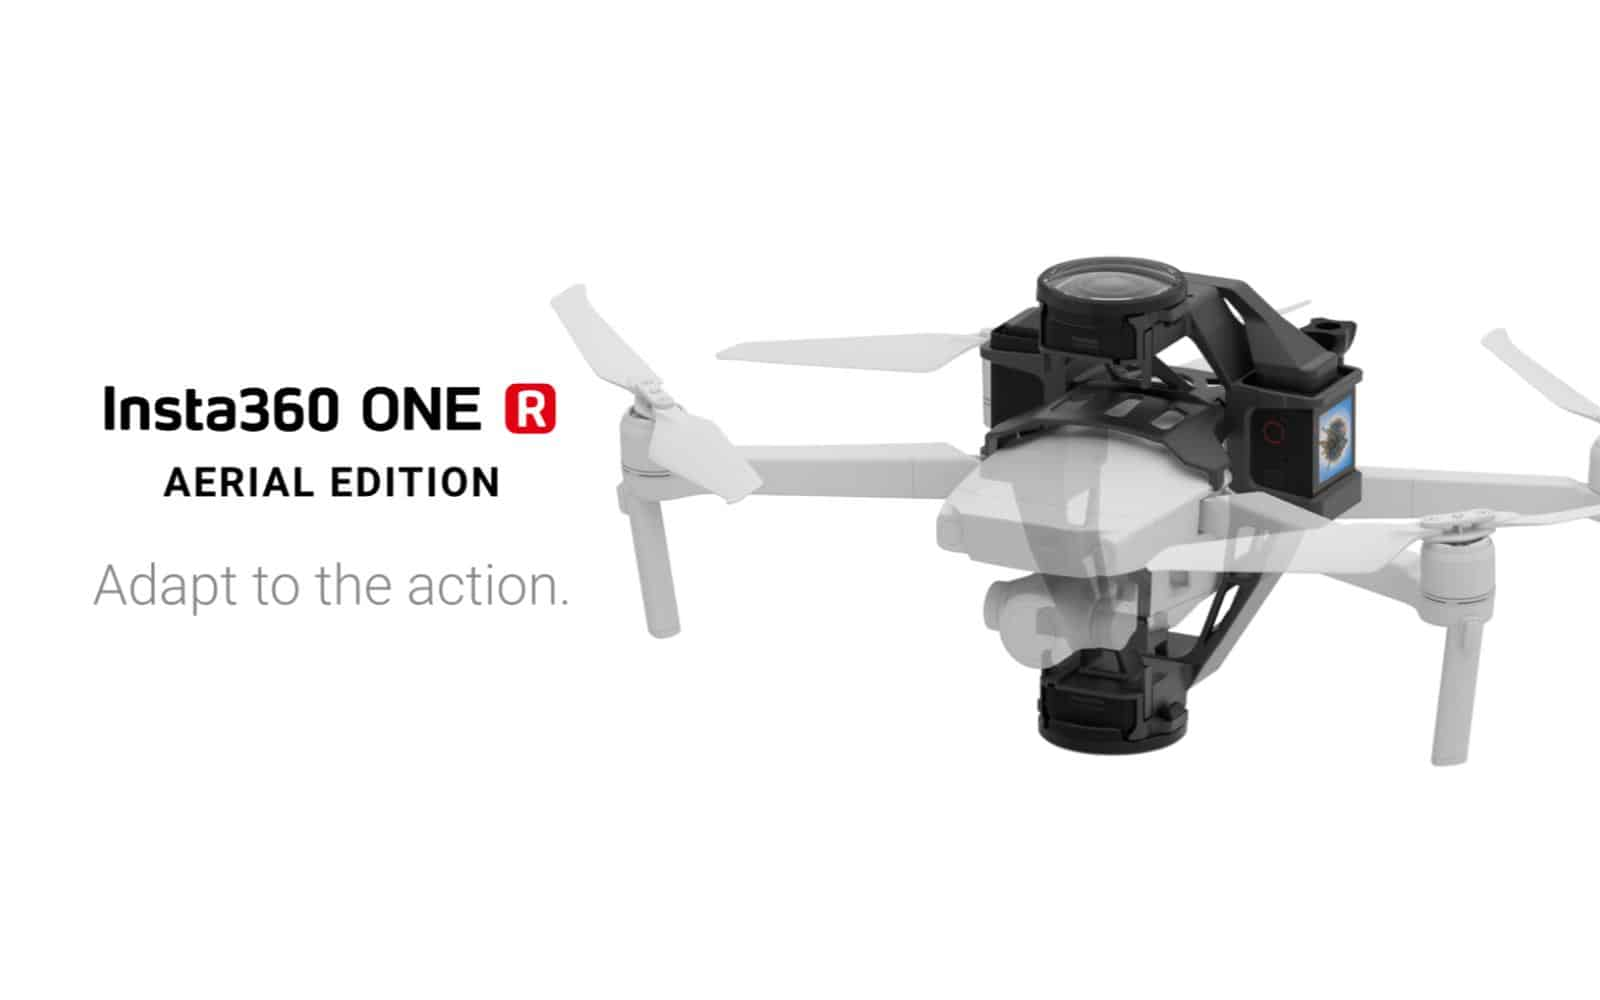 Insta360 One R aerial edition presser